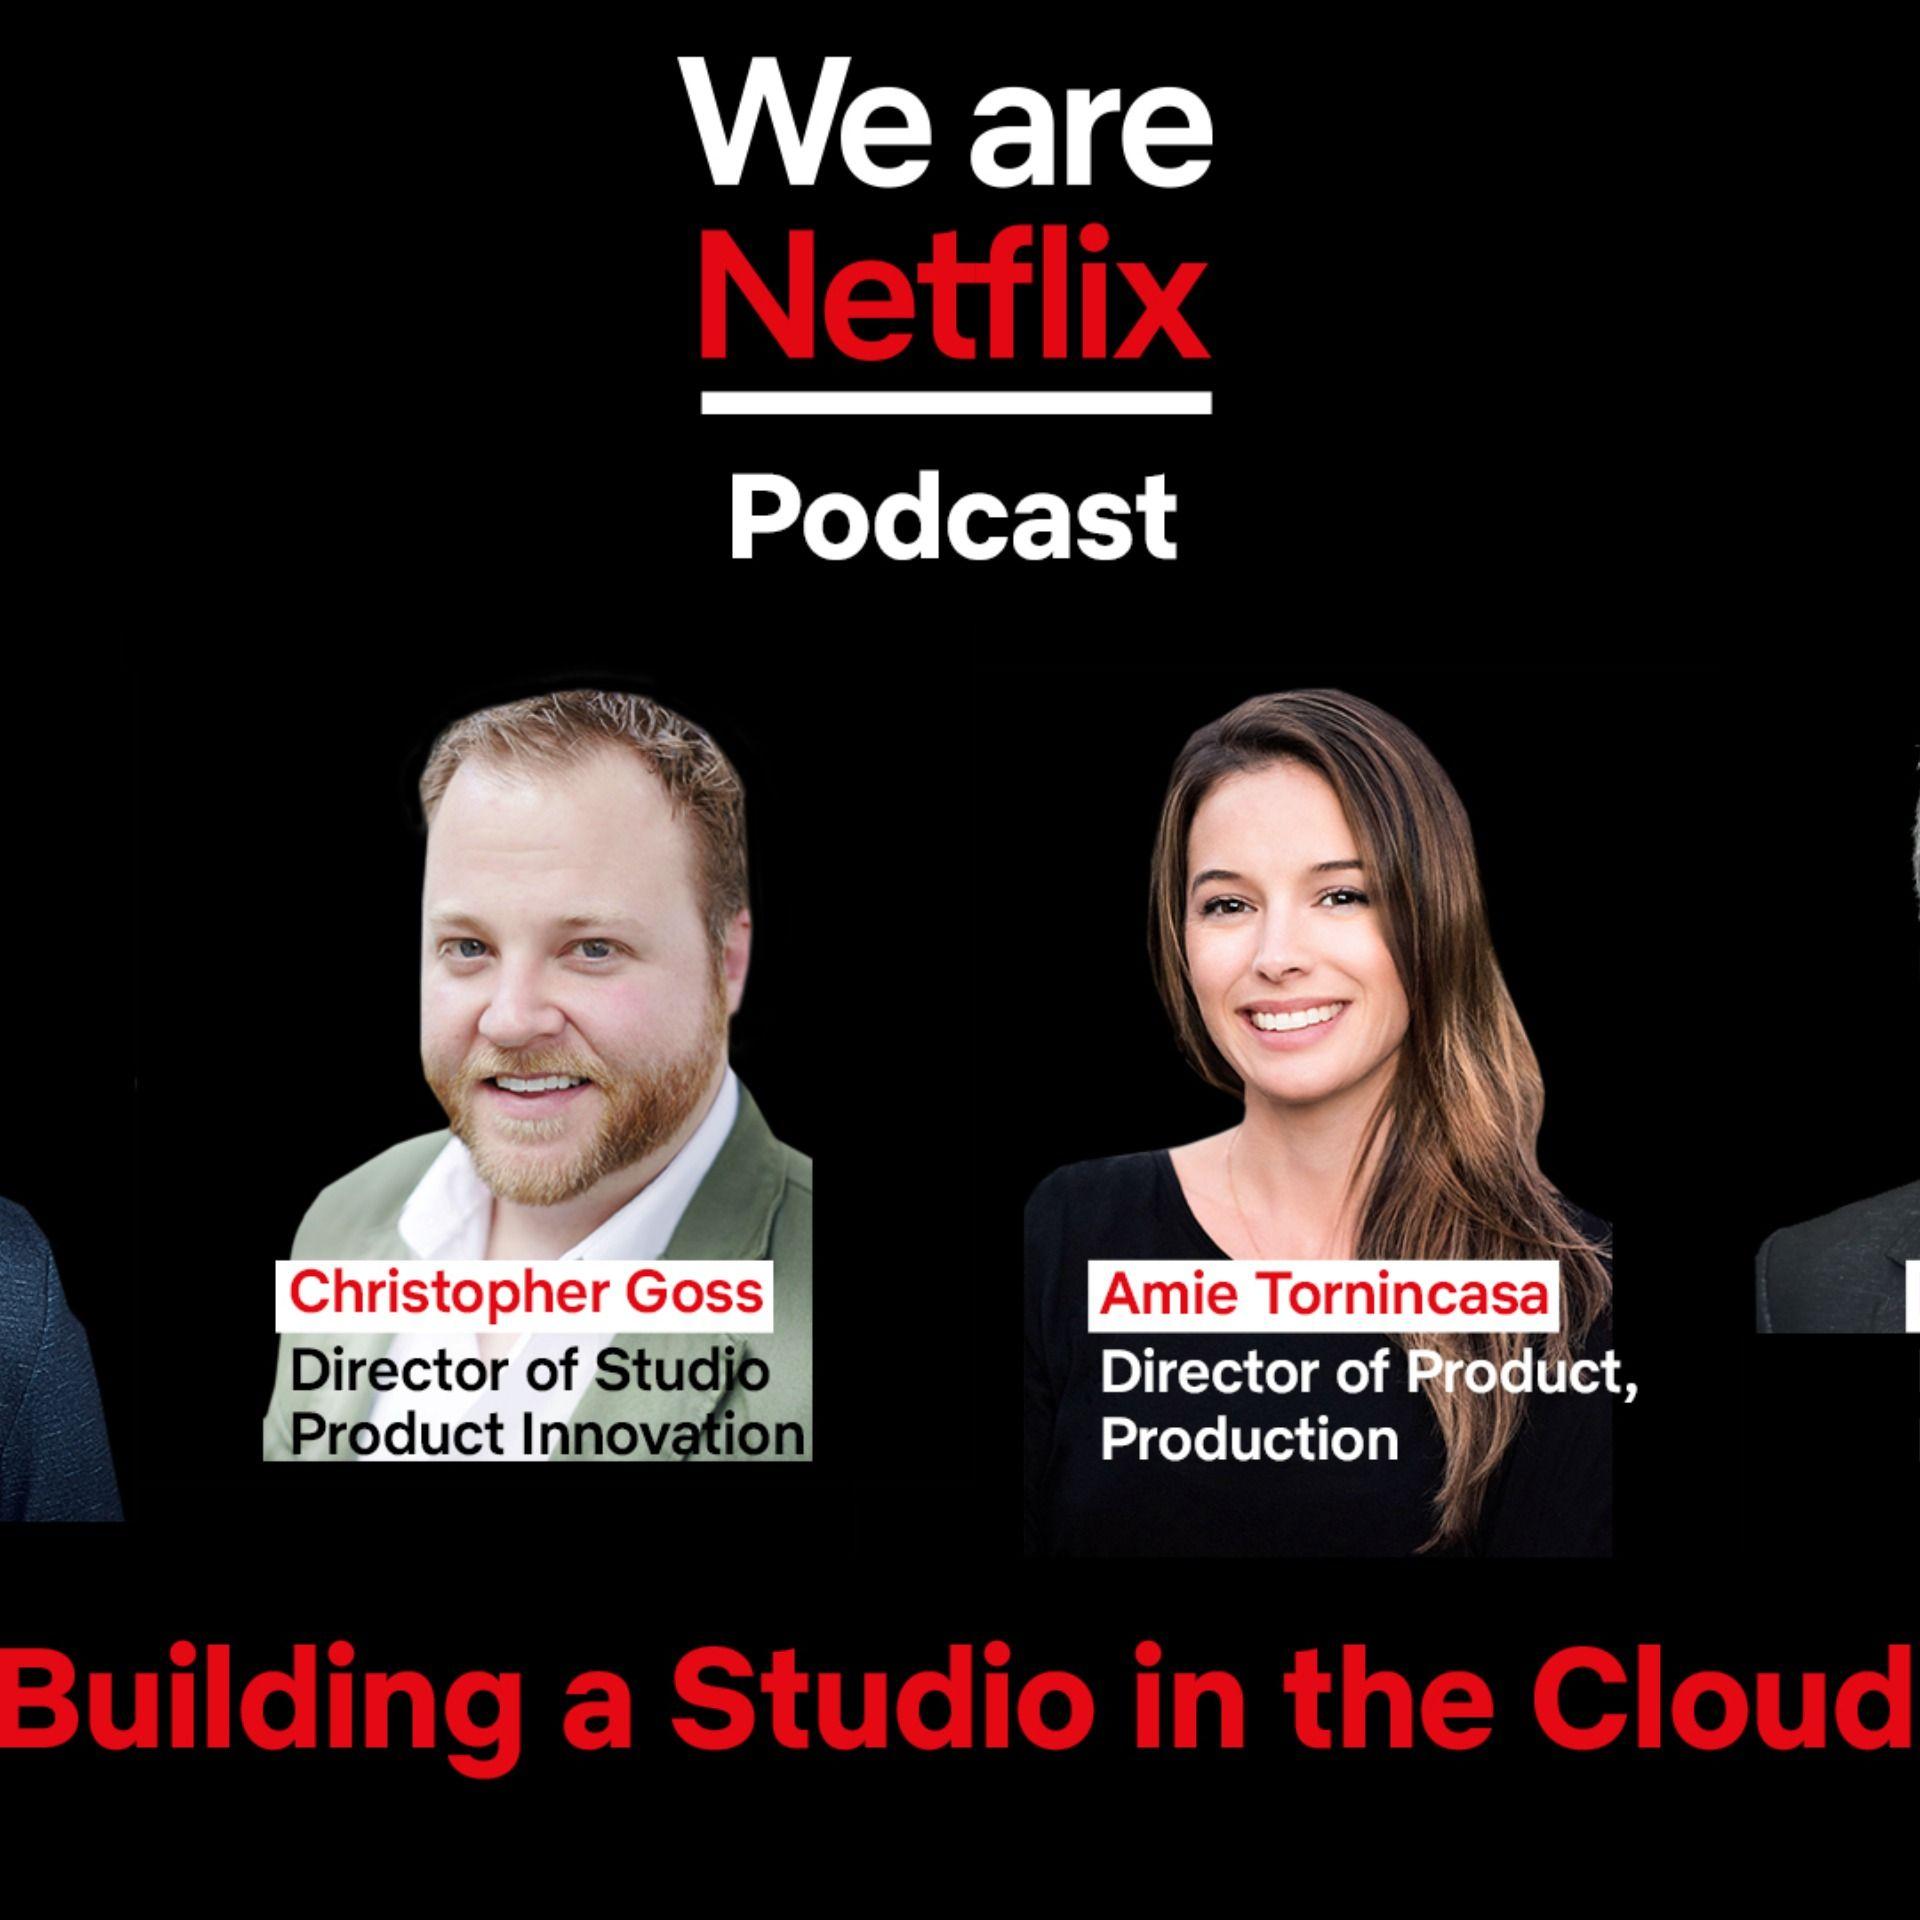 Building a Studio in the Cloud